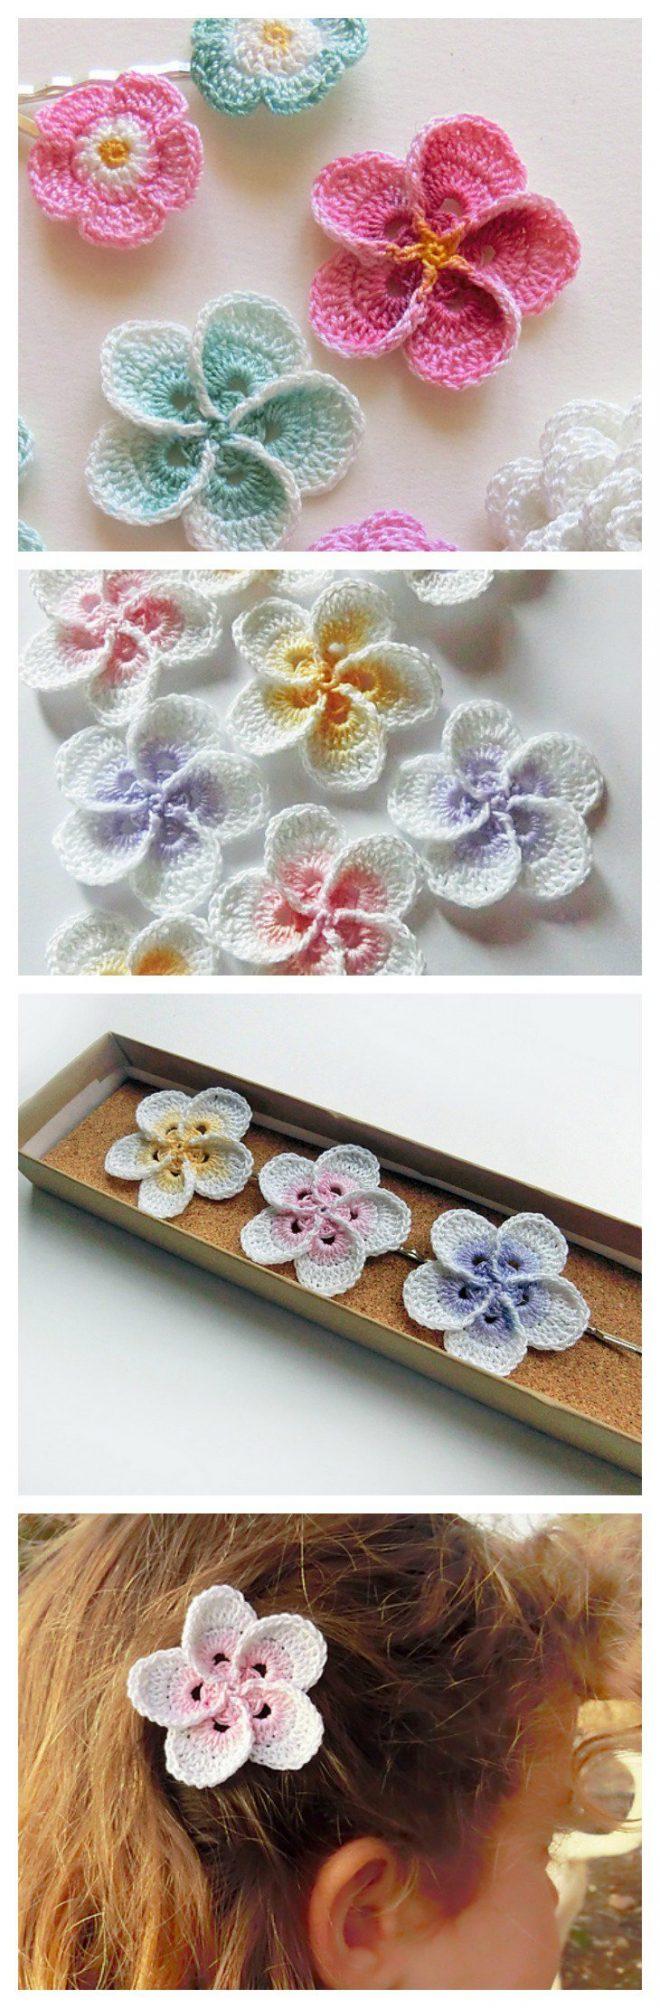 crochet-hawaiian-plumeria-flower